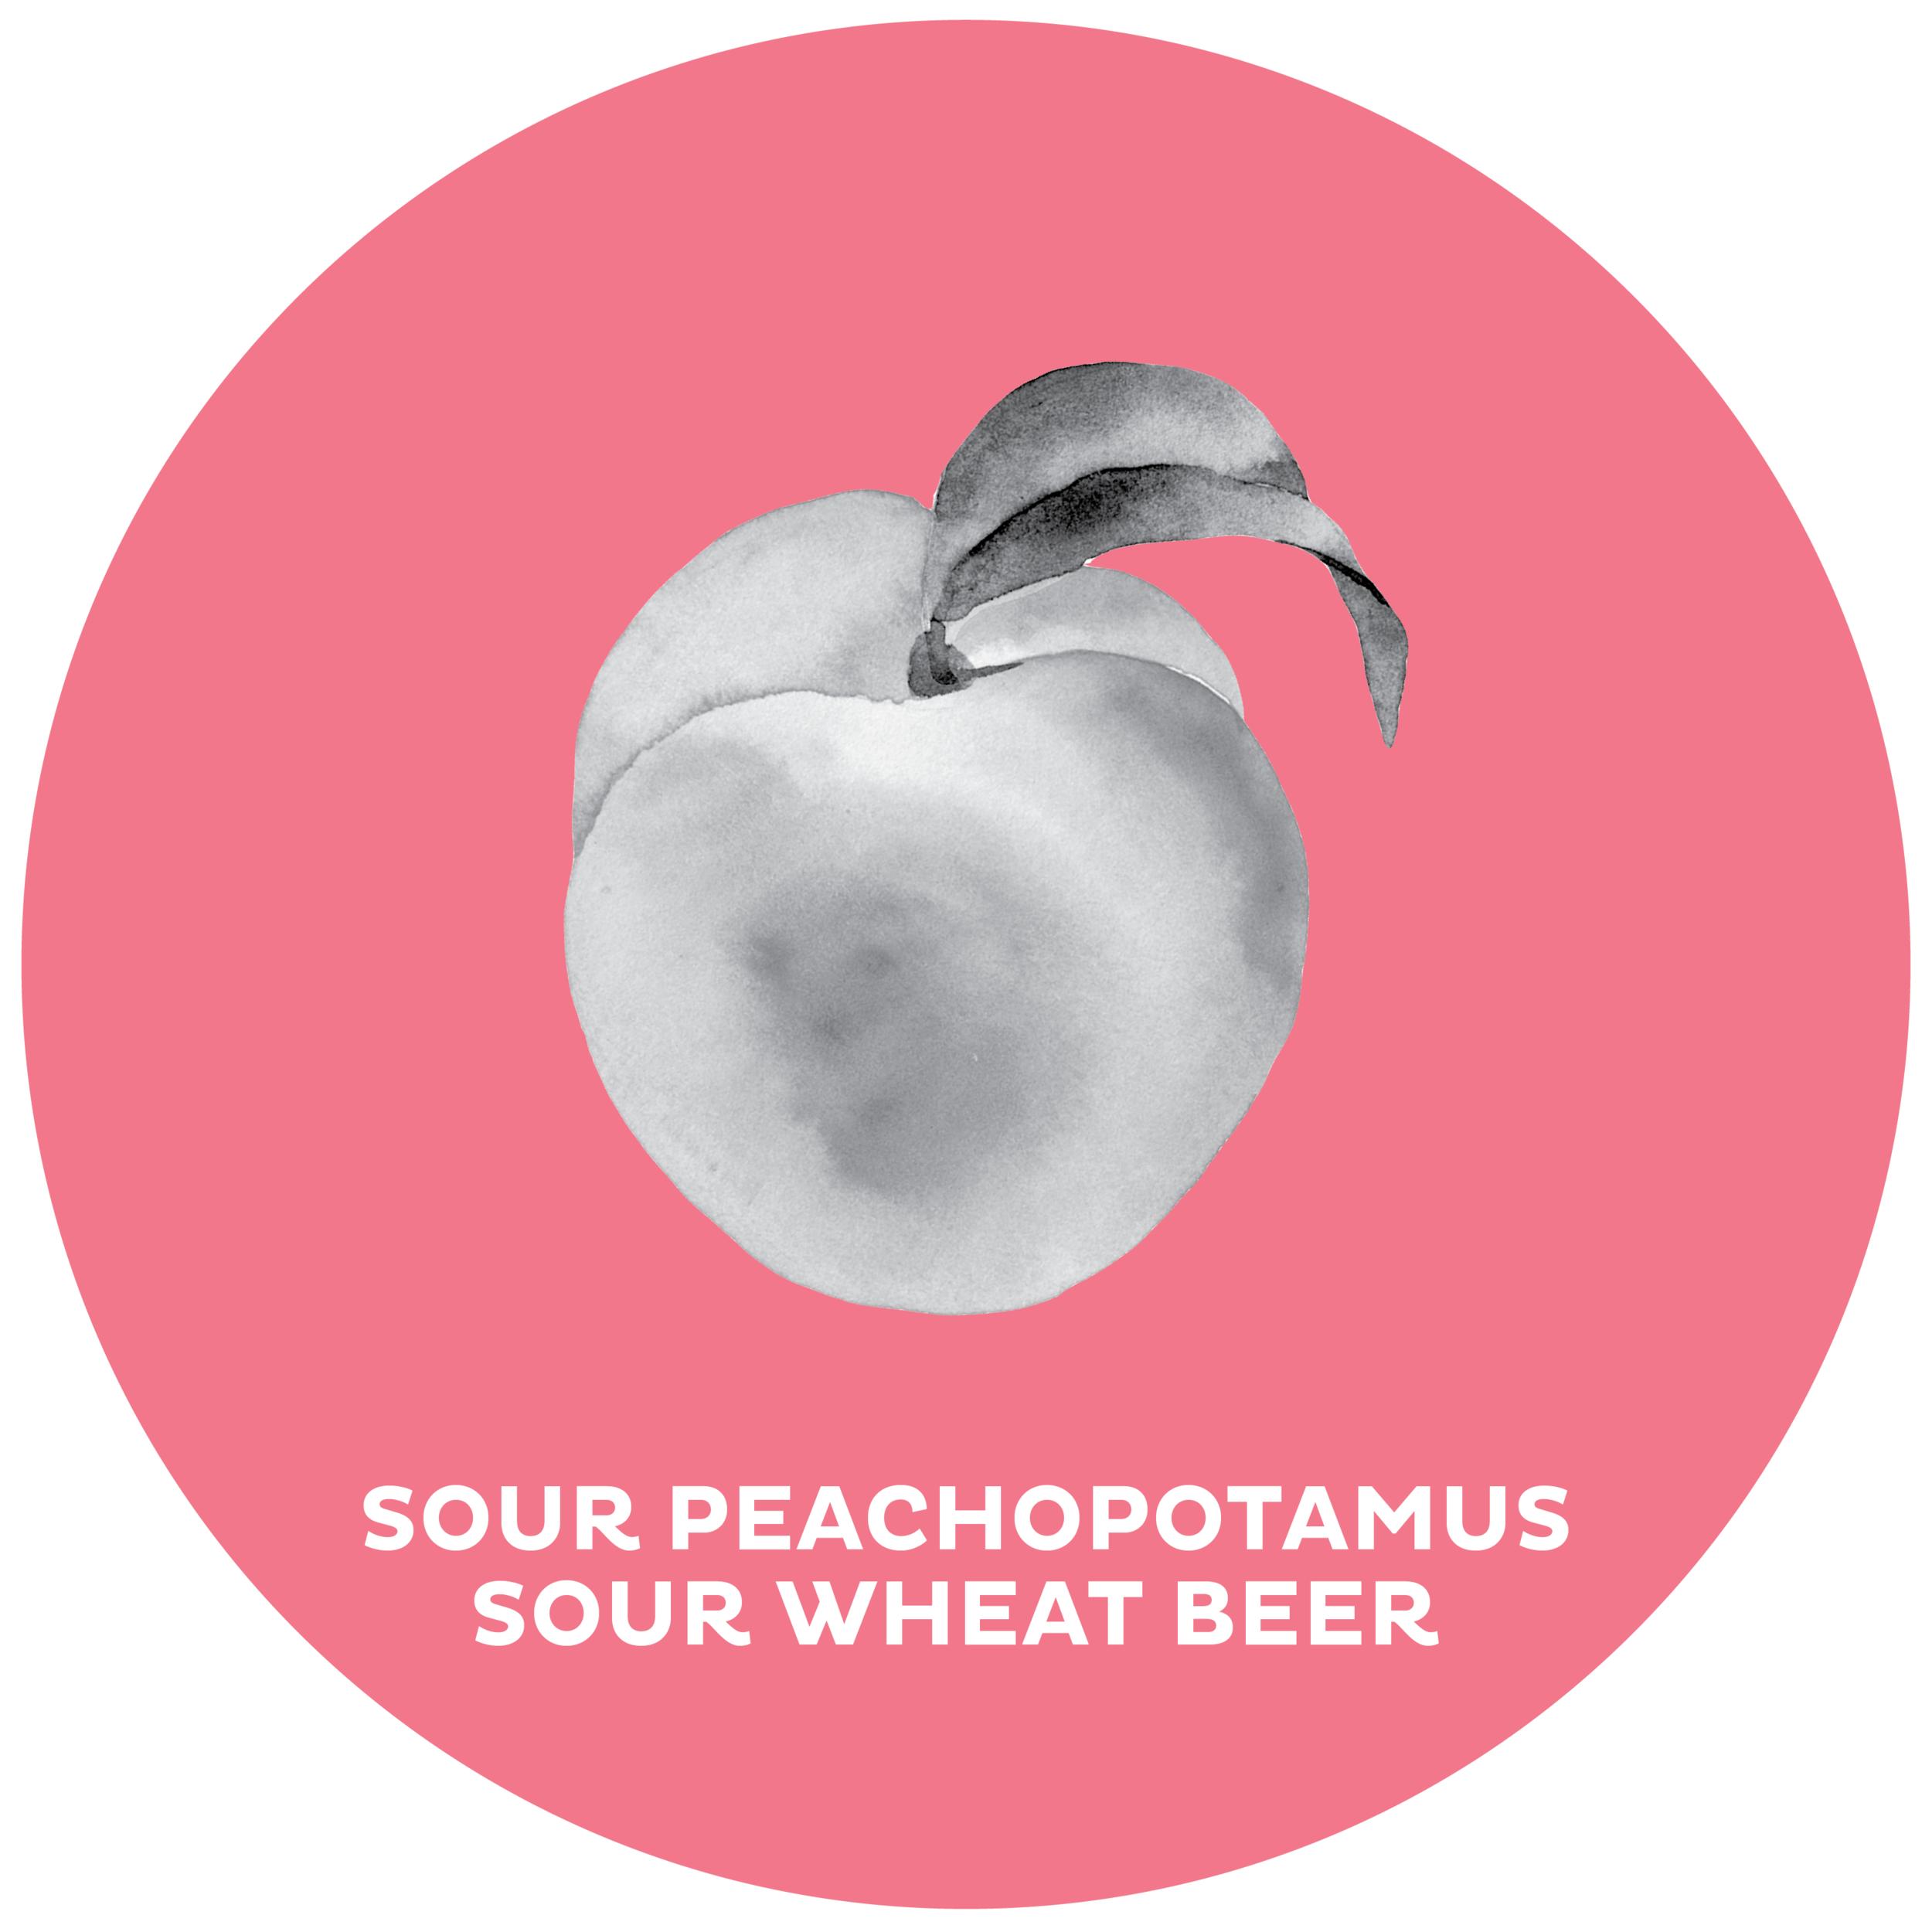 Sourpeachopotamus-01.png